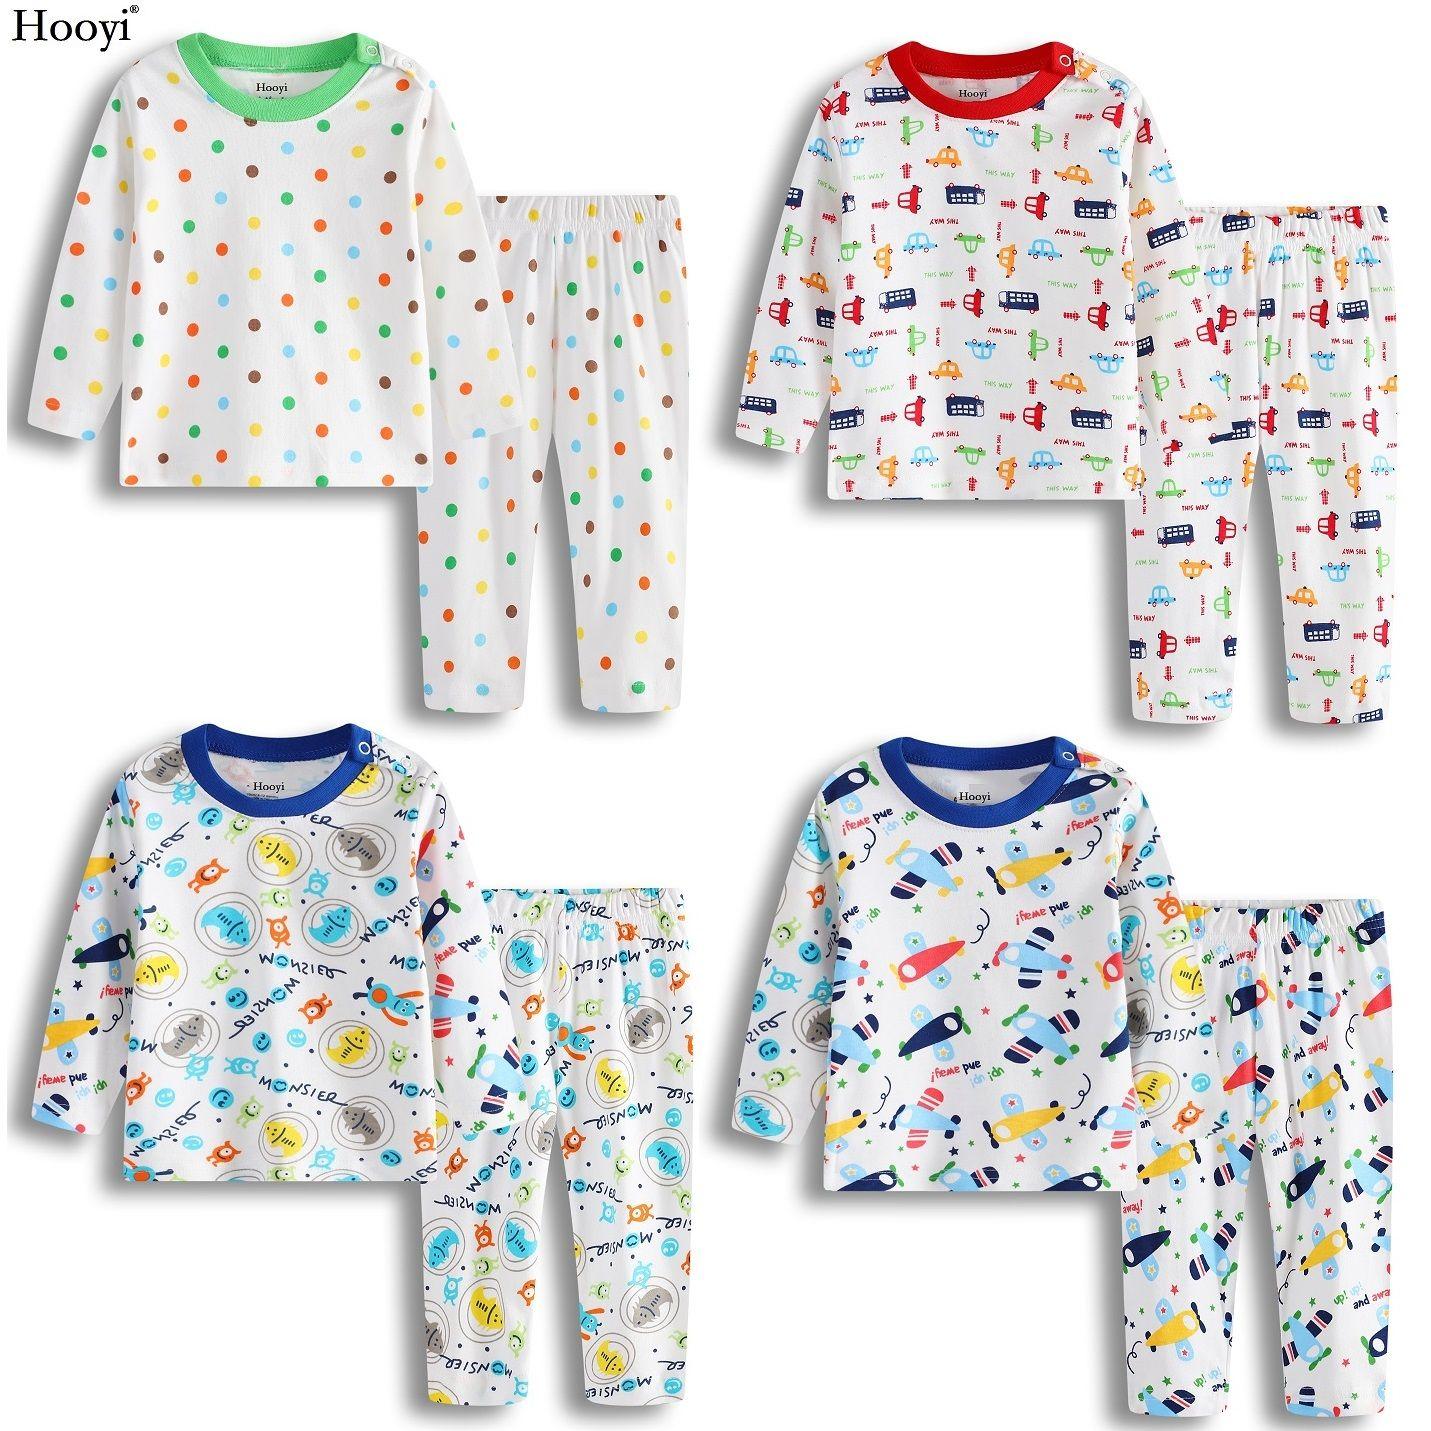 4f032bc675 Hooyi 2018 Baby Boys Pajamas Clothes Suit 100% Cotton Fashion Children  Sleepwear Top Quality Newborn T Shirt Pant Set 0 1 2 Year PJ S Matching Kids  Pajamas ...